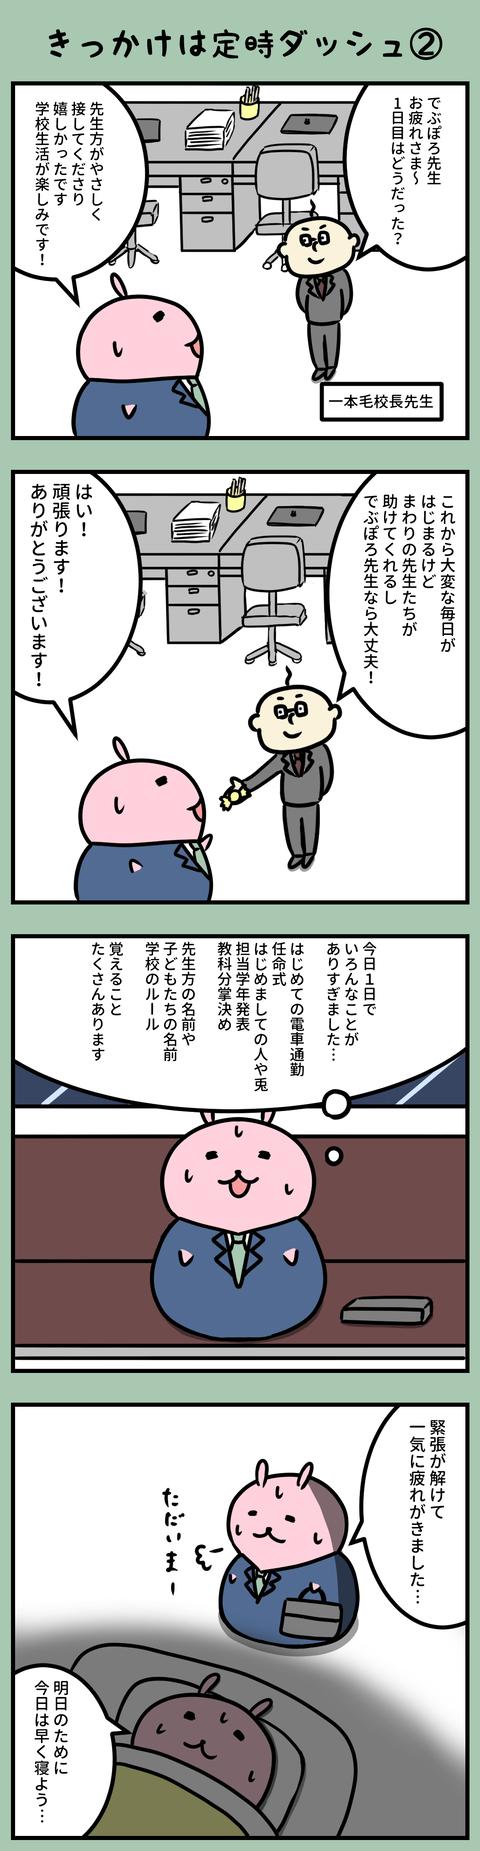 manga-yuzuporo46-1